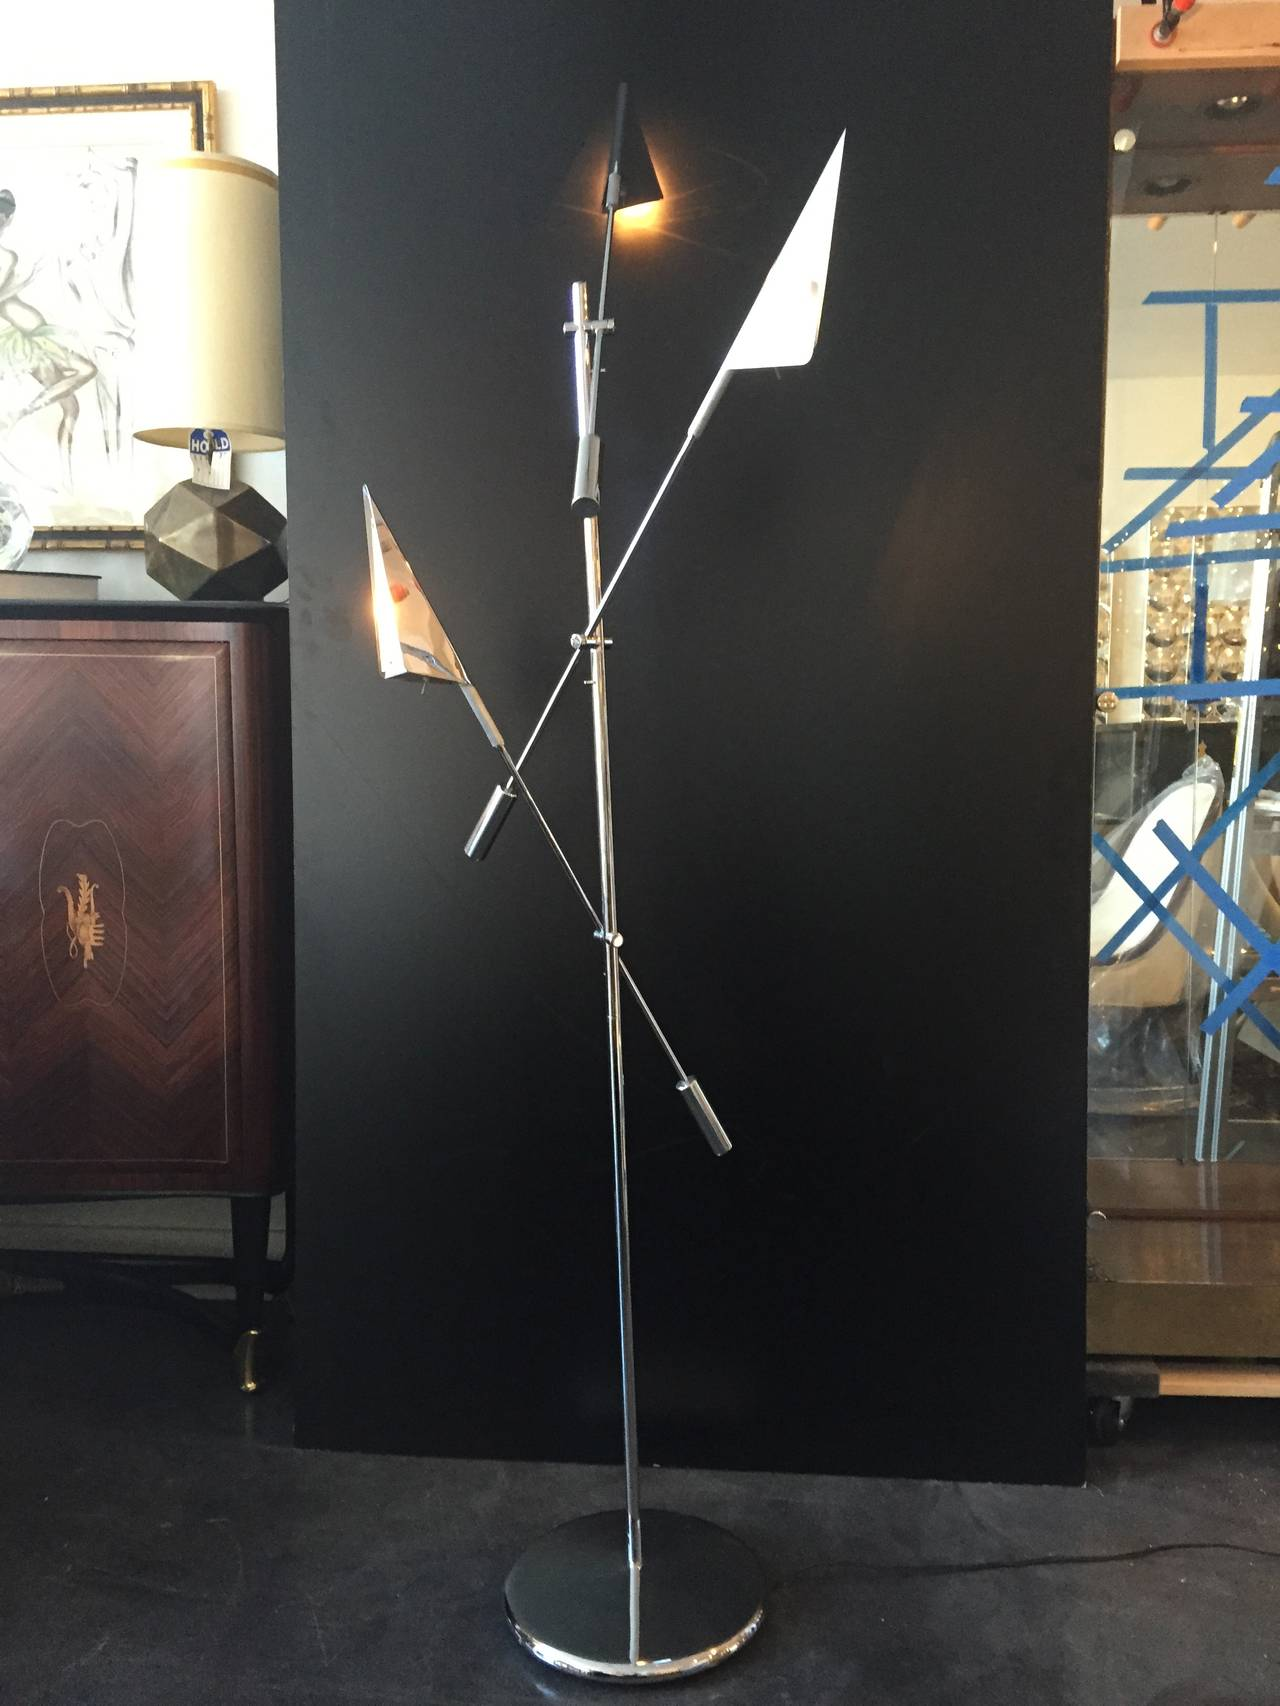 Chrome three arm floor lamp by Harry Allen for Kovacs lighting